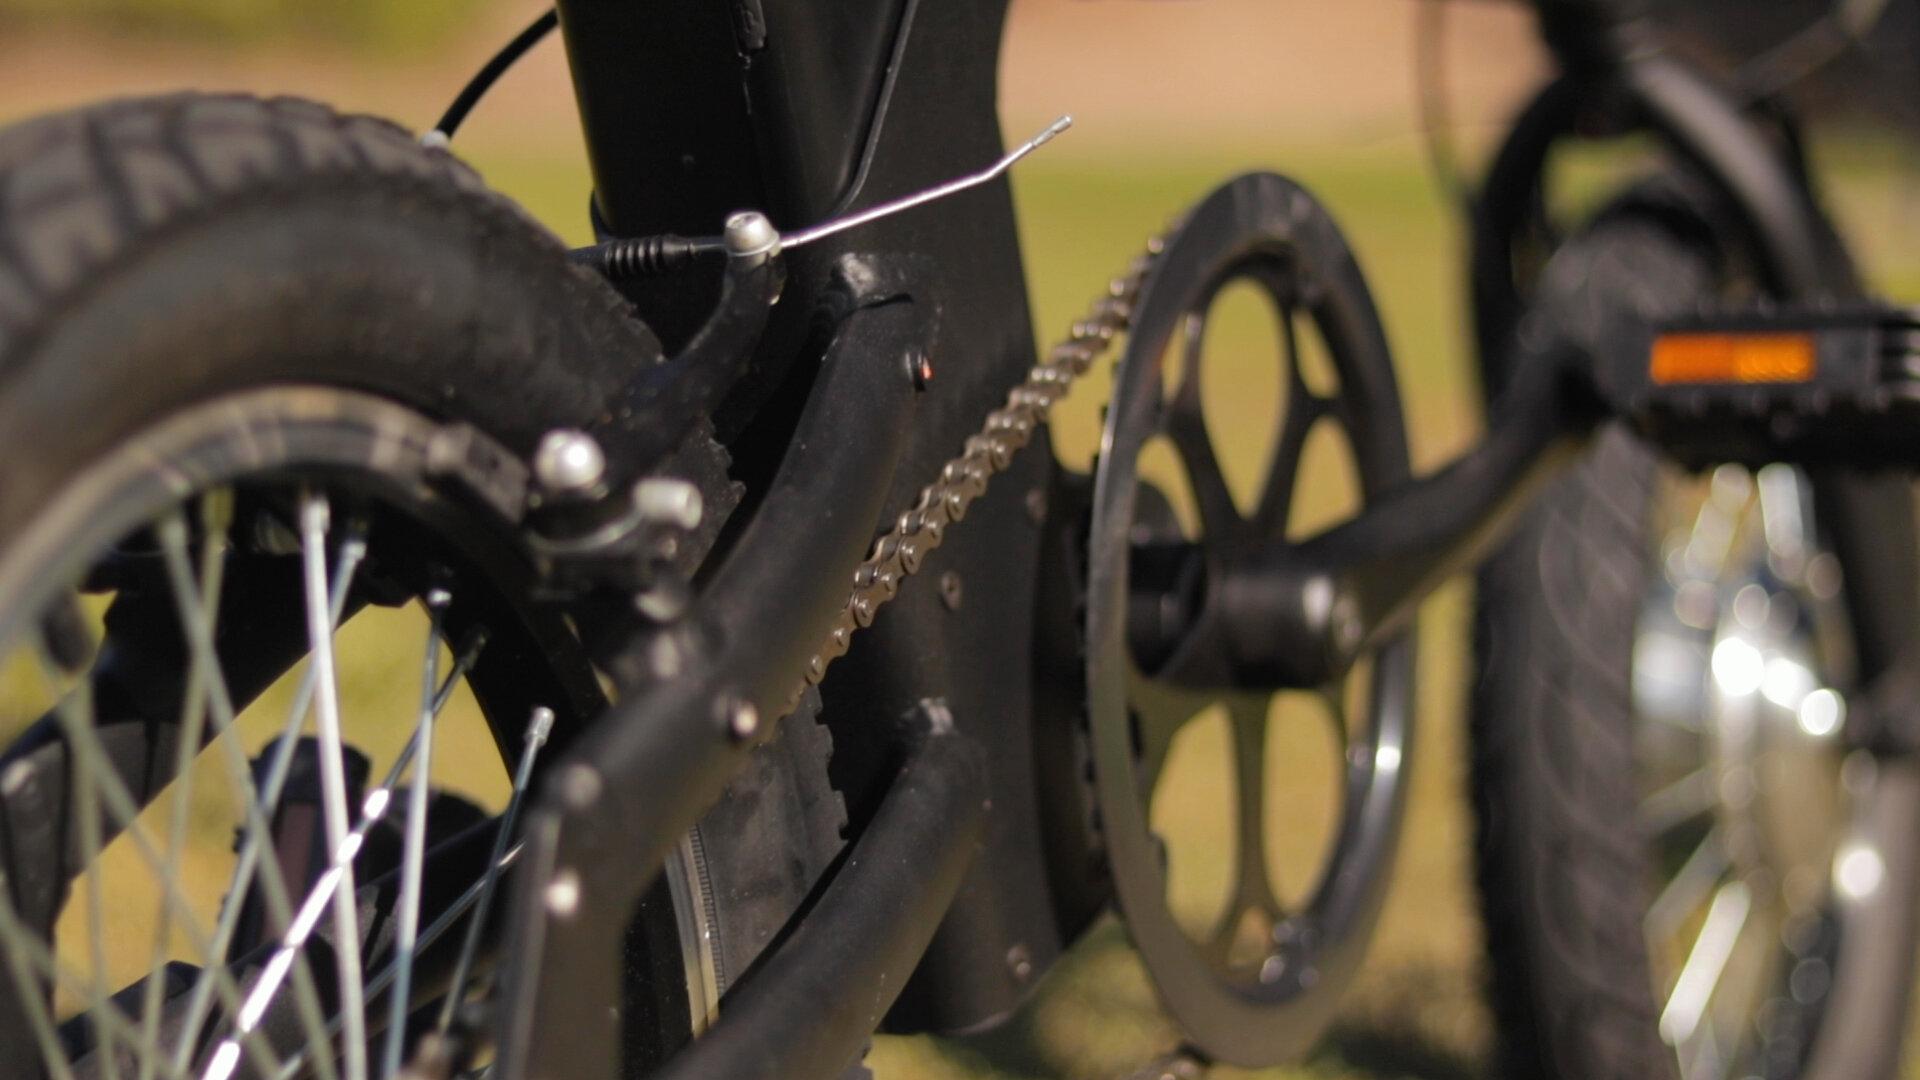 gotrax-shift-s1-electric-bike-review-2019-chain.jpg